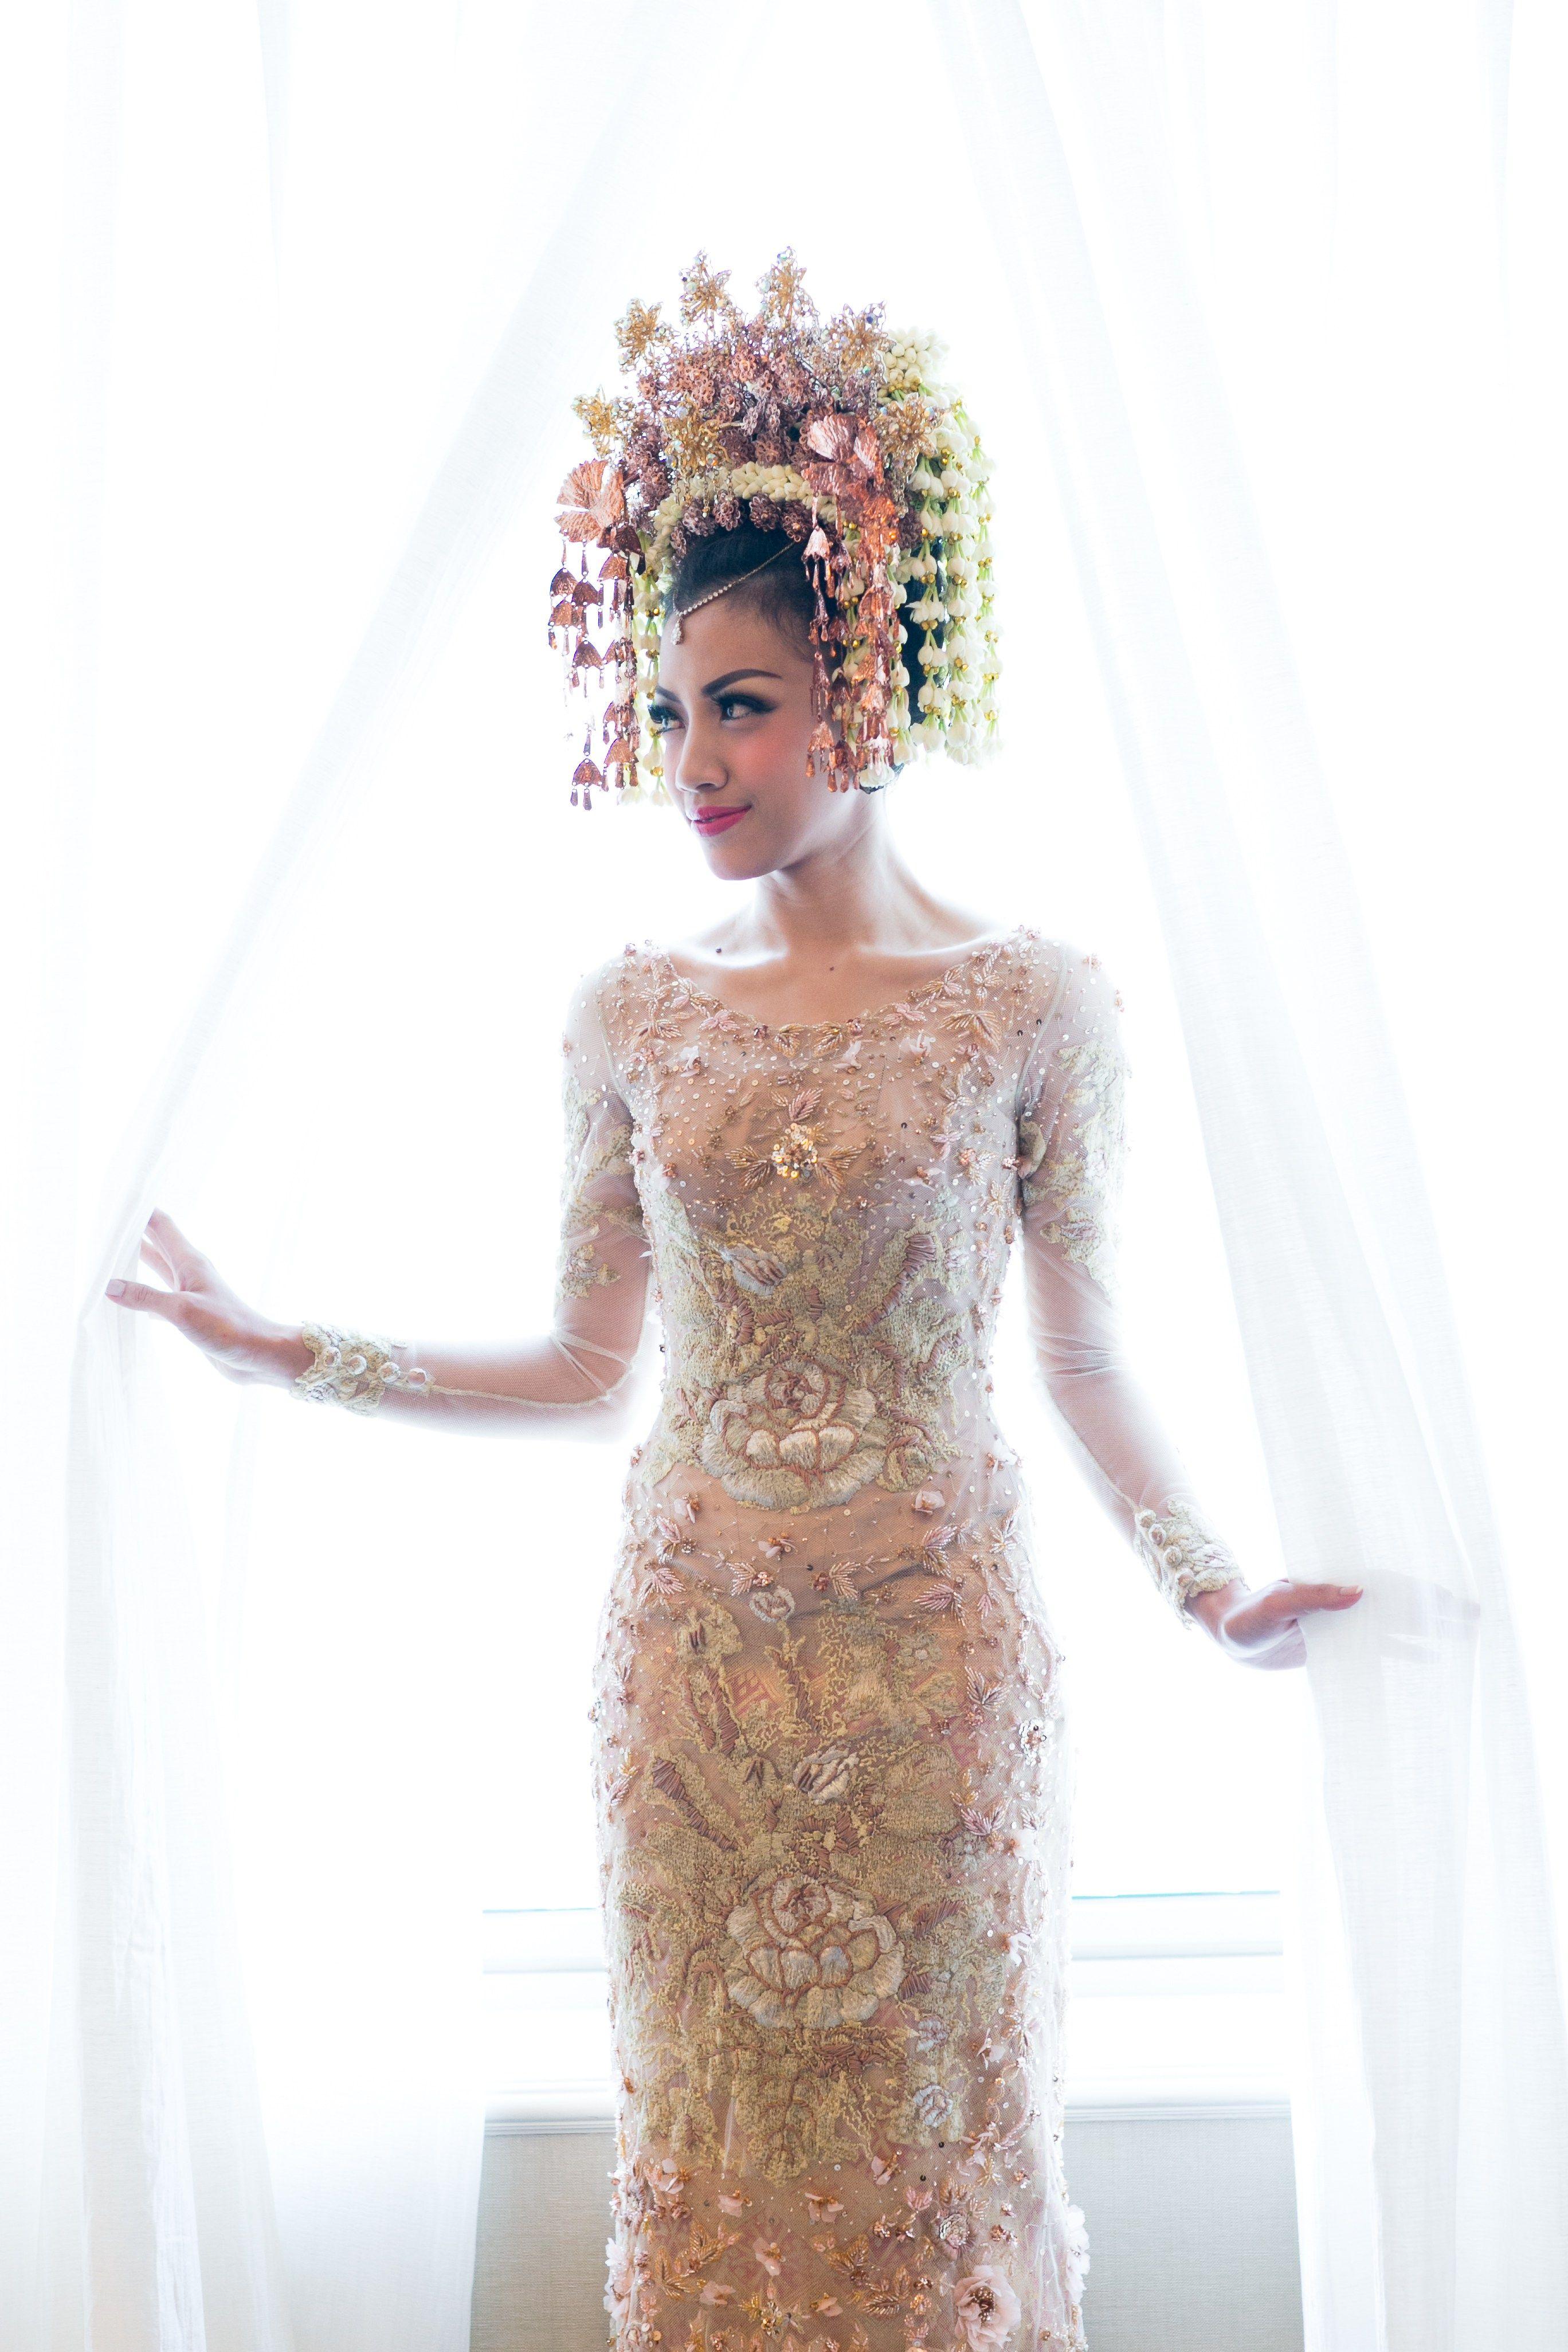 Pernikahan Adat Minang dan Jawa Bernuansa Rumah - Photo 8-9-15, 7 45 ...